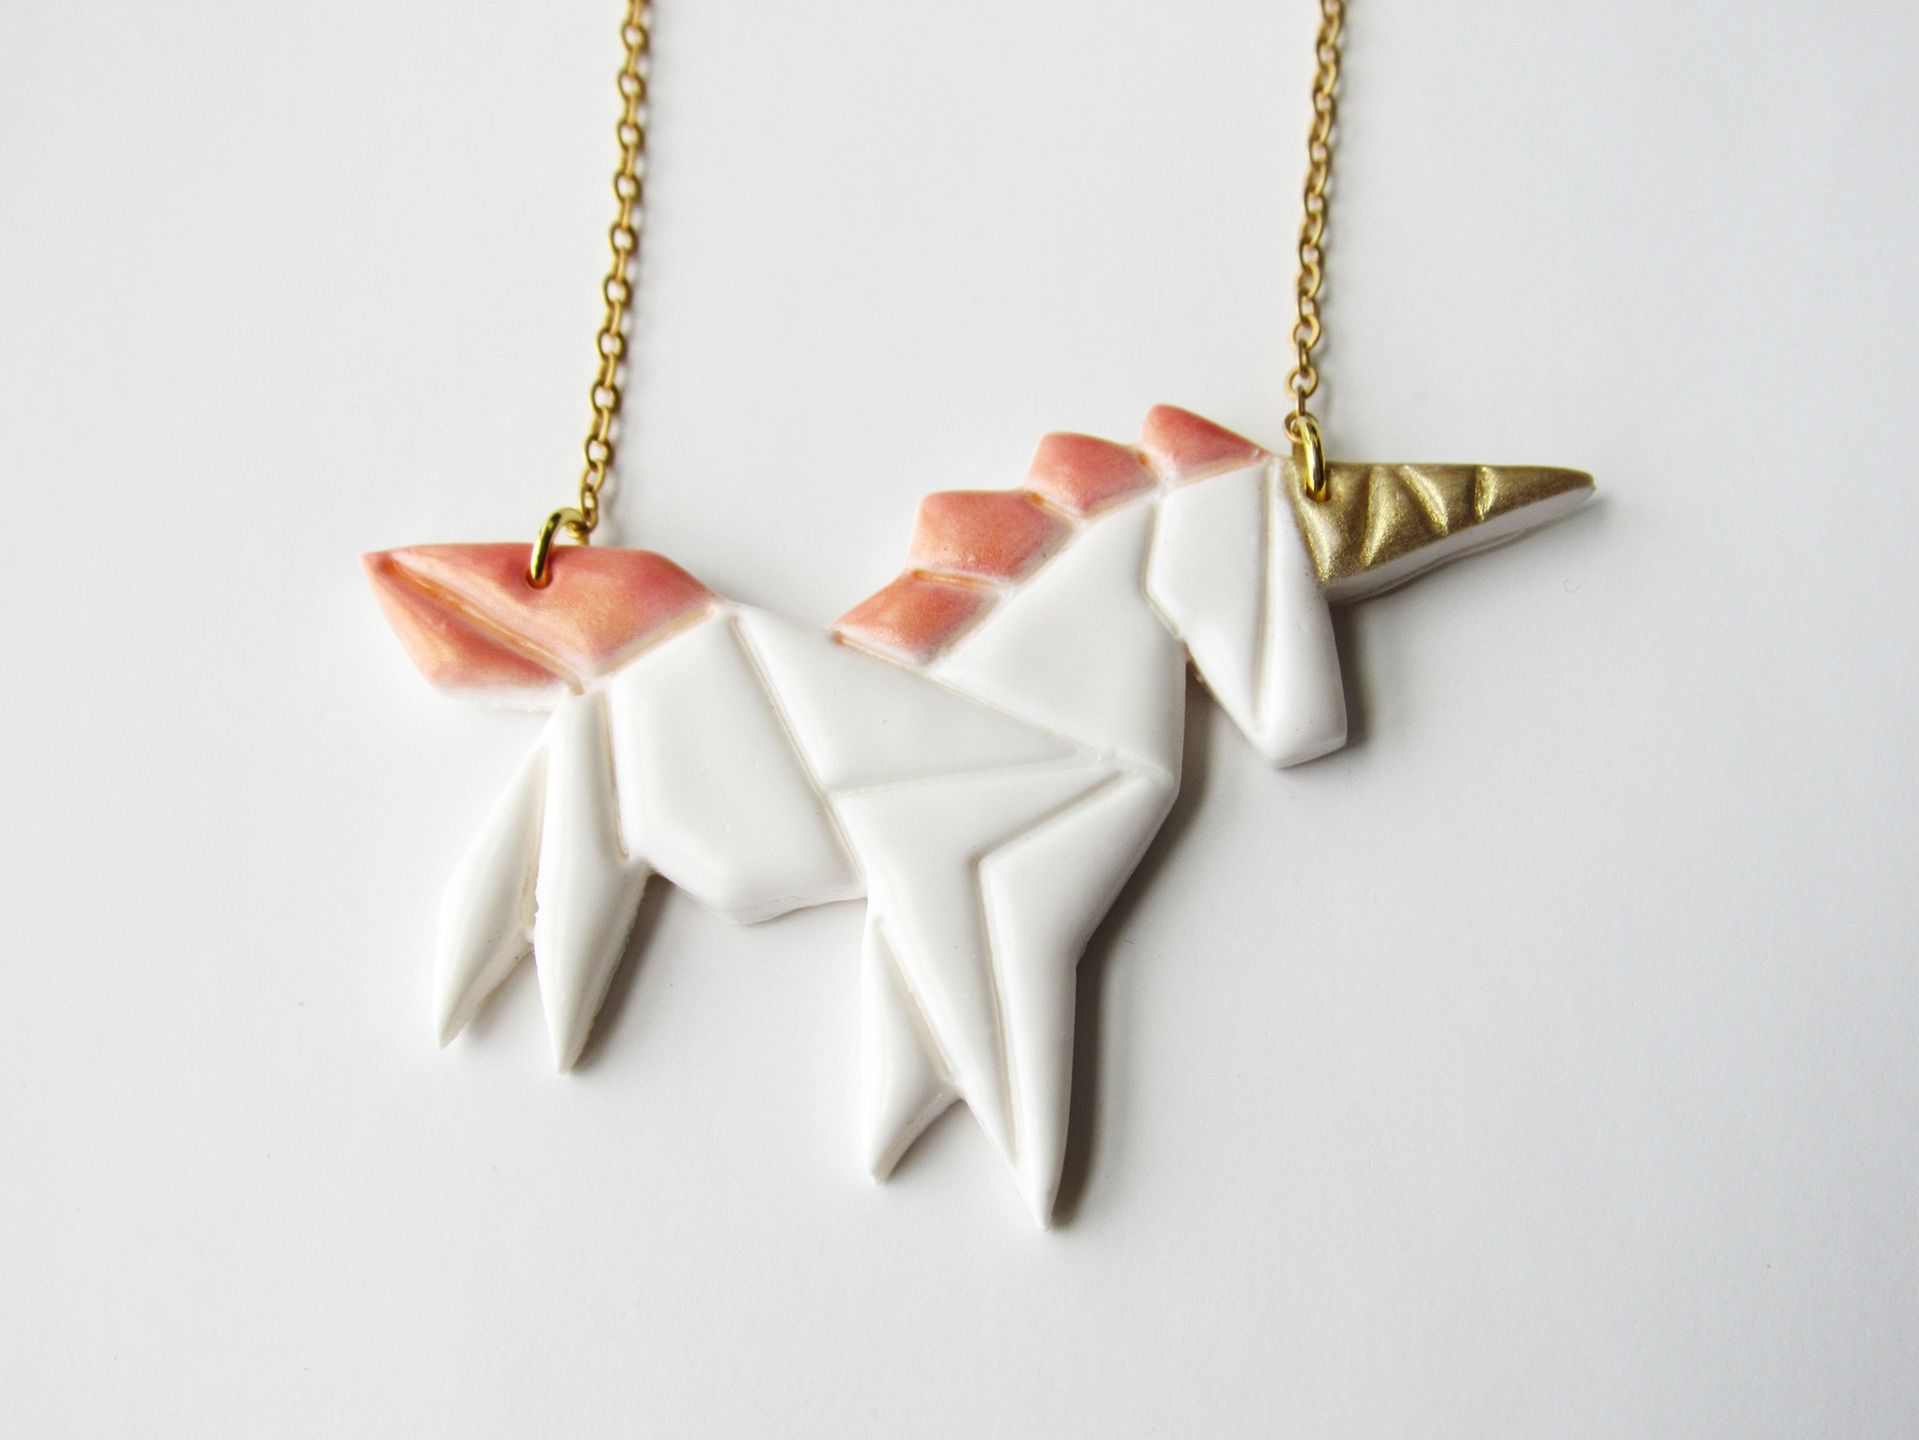 Reserve Collier Licorne Origami Blanche En Pâte Fimo Et Laiton